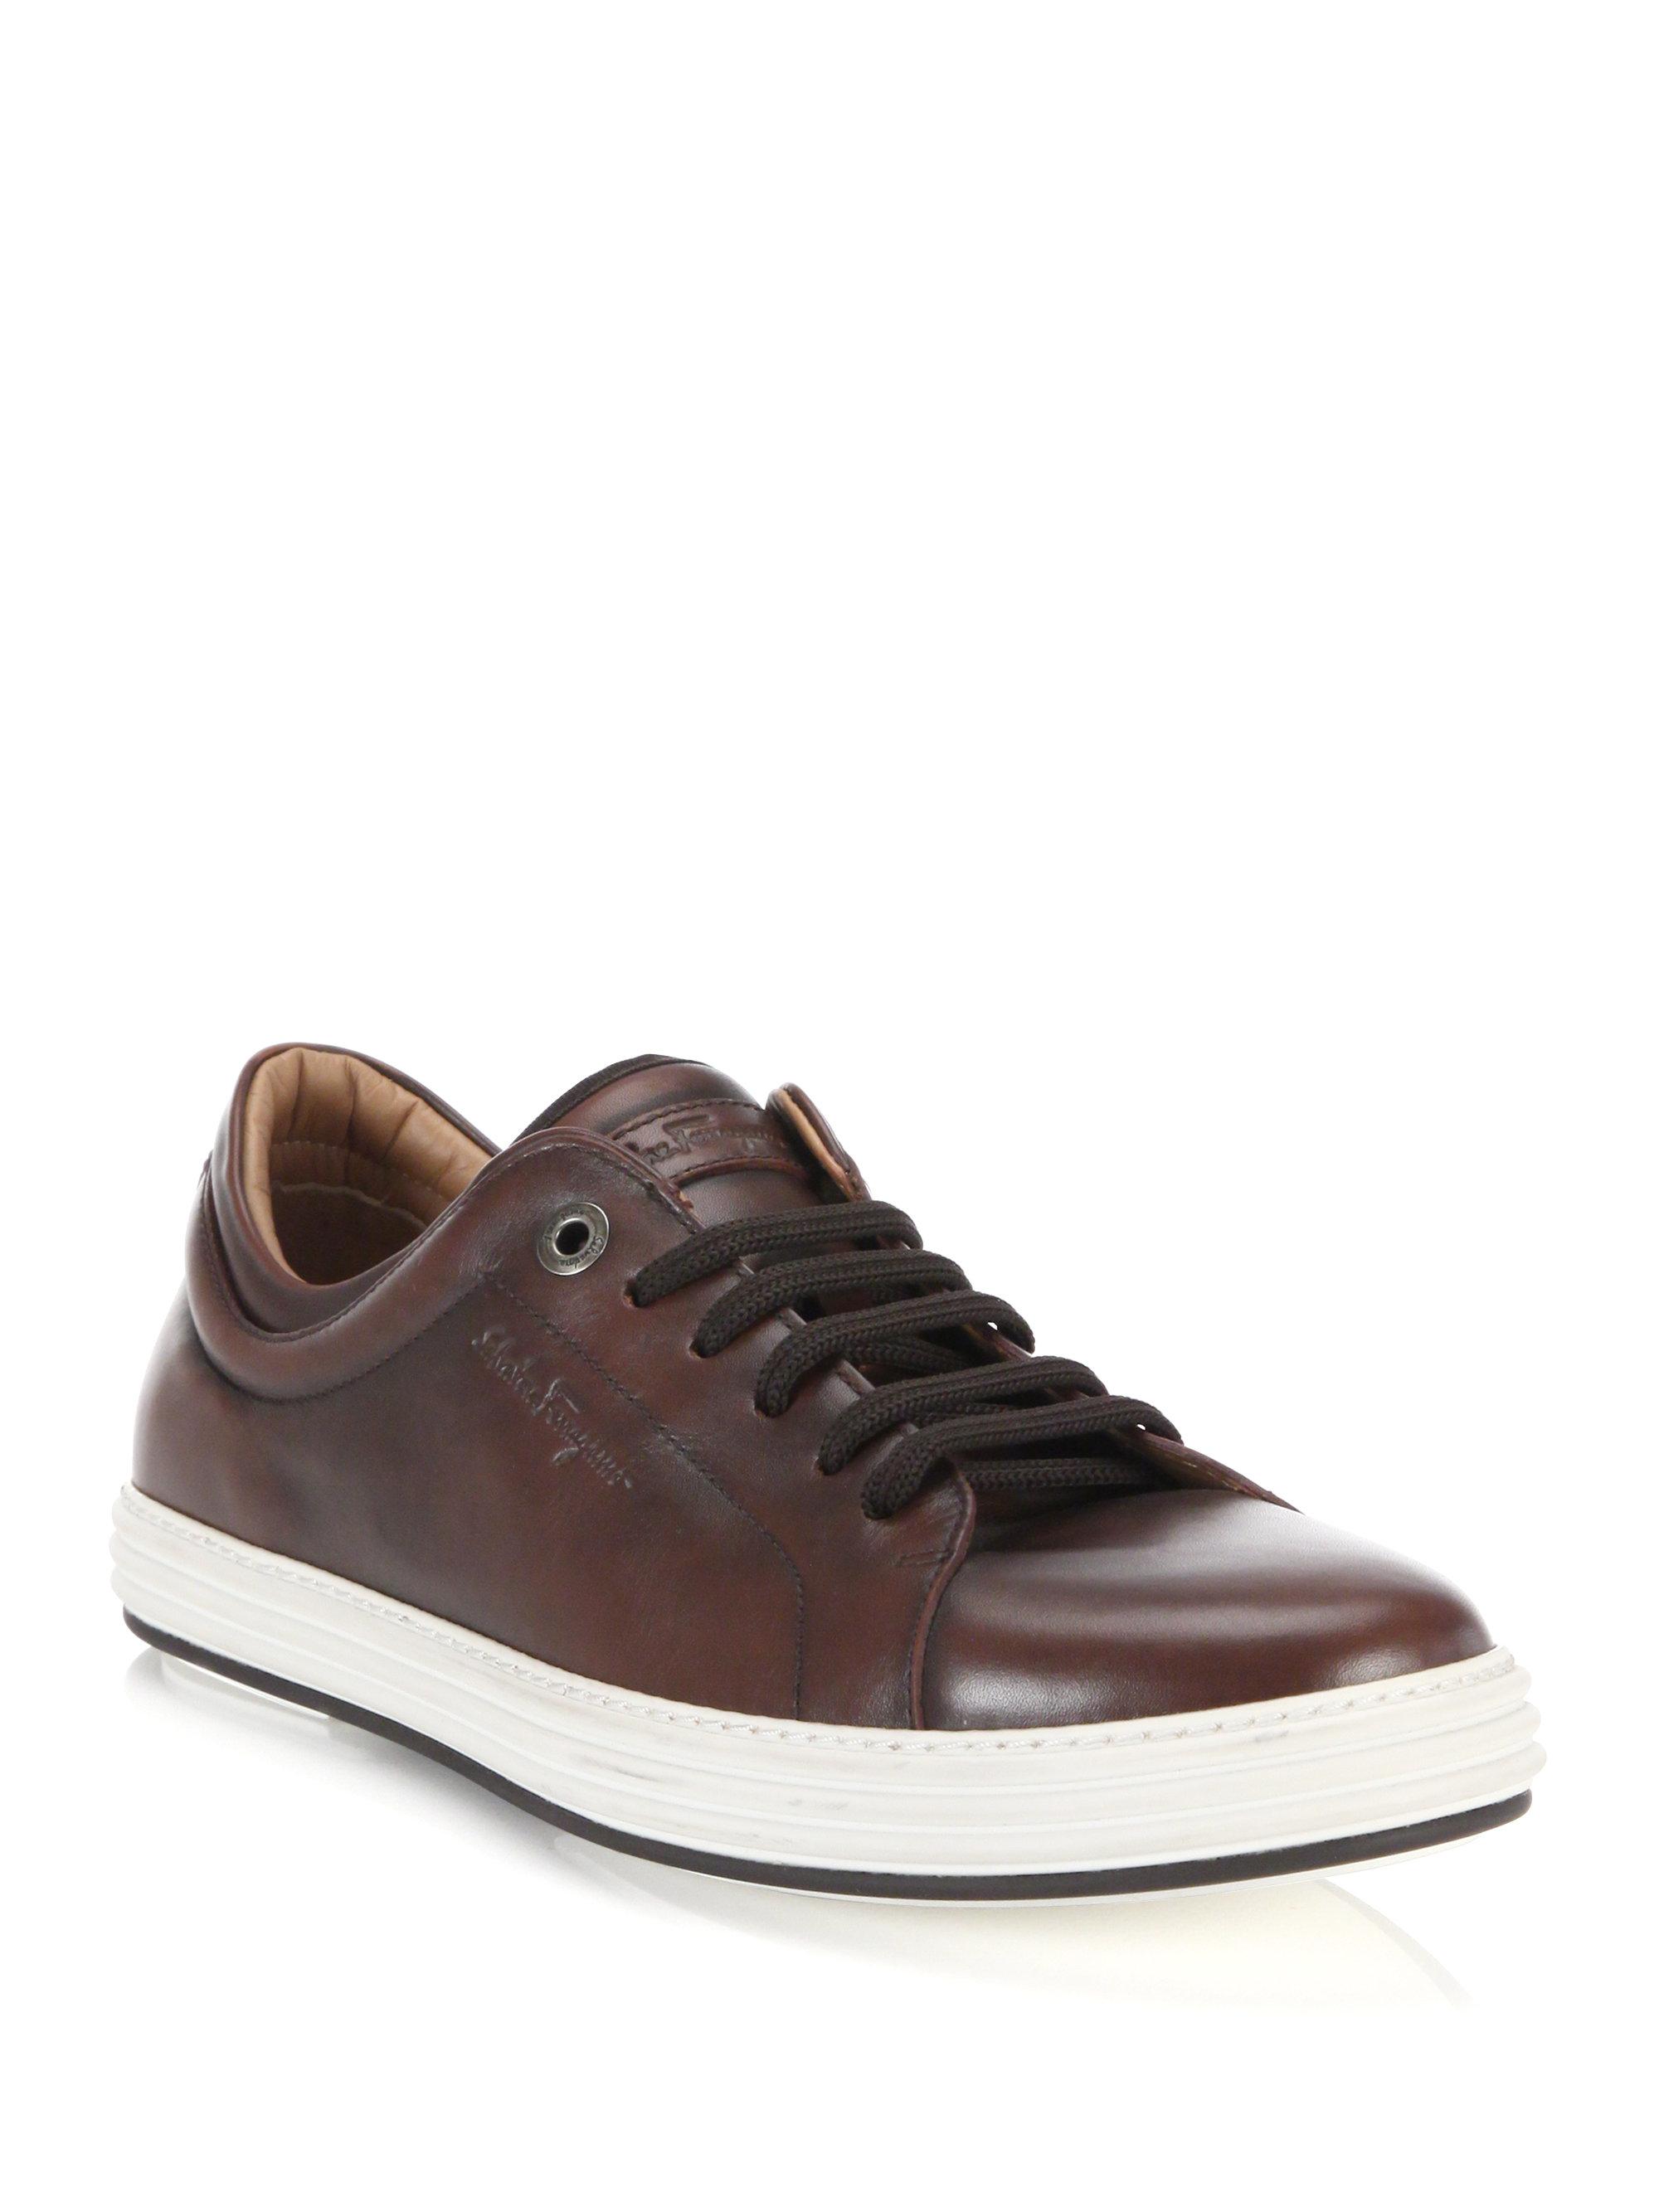 best service 40f0c 5a00b salvatore-ferragamo-radica-newport-low-top-leather-sneakers-product-0-940821162-normal.jpeg